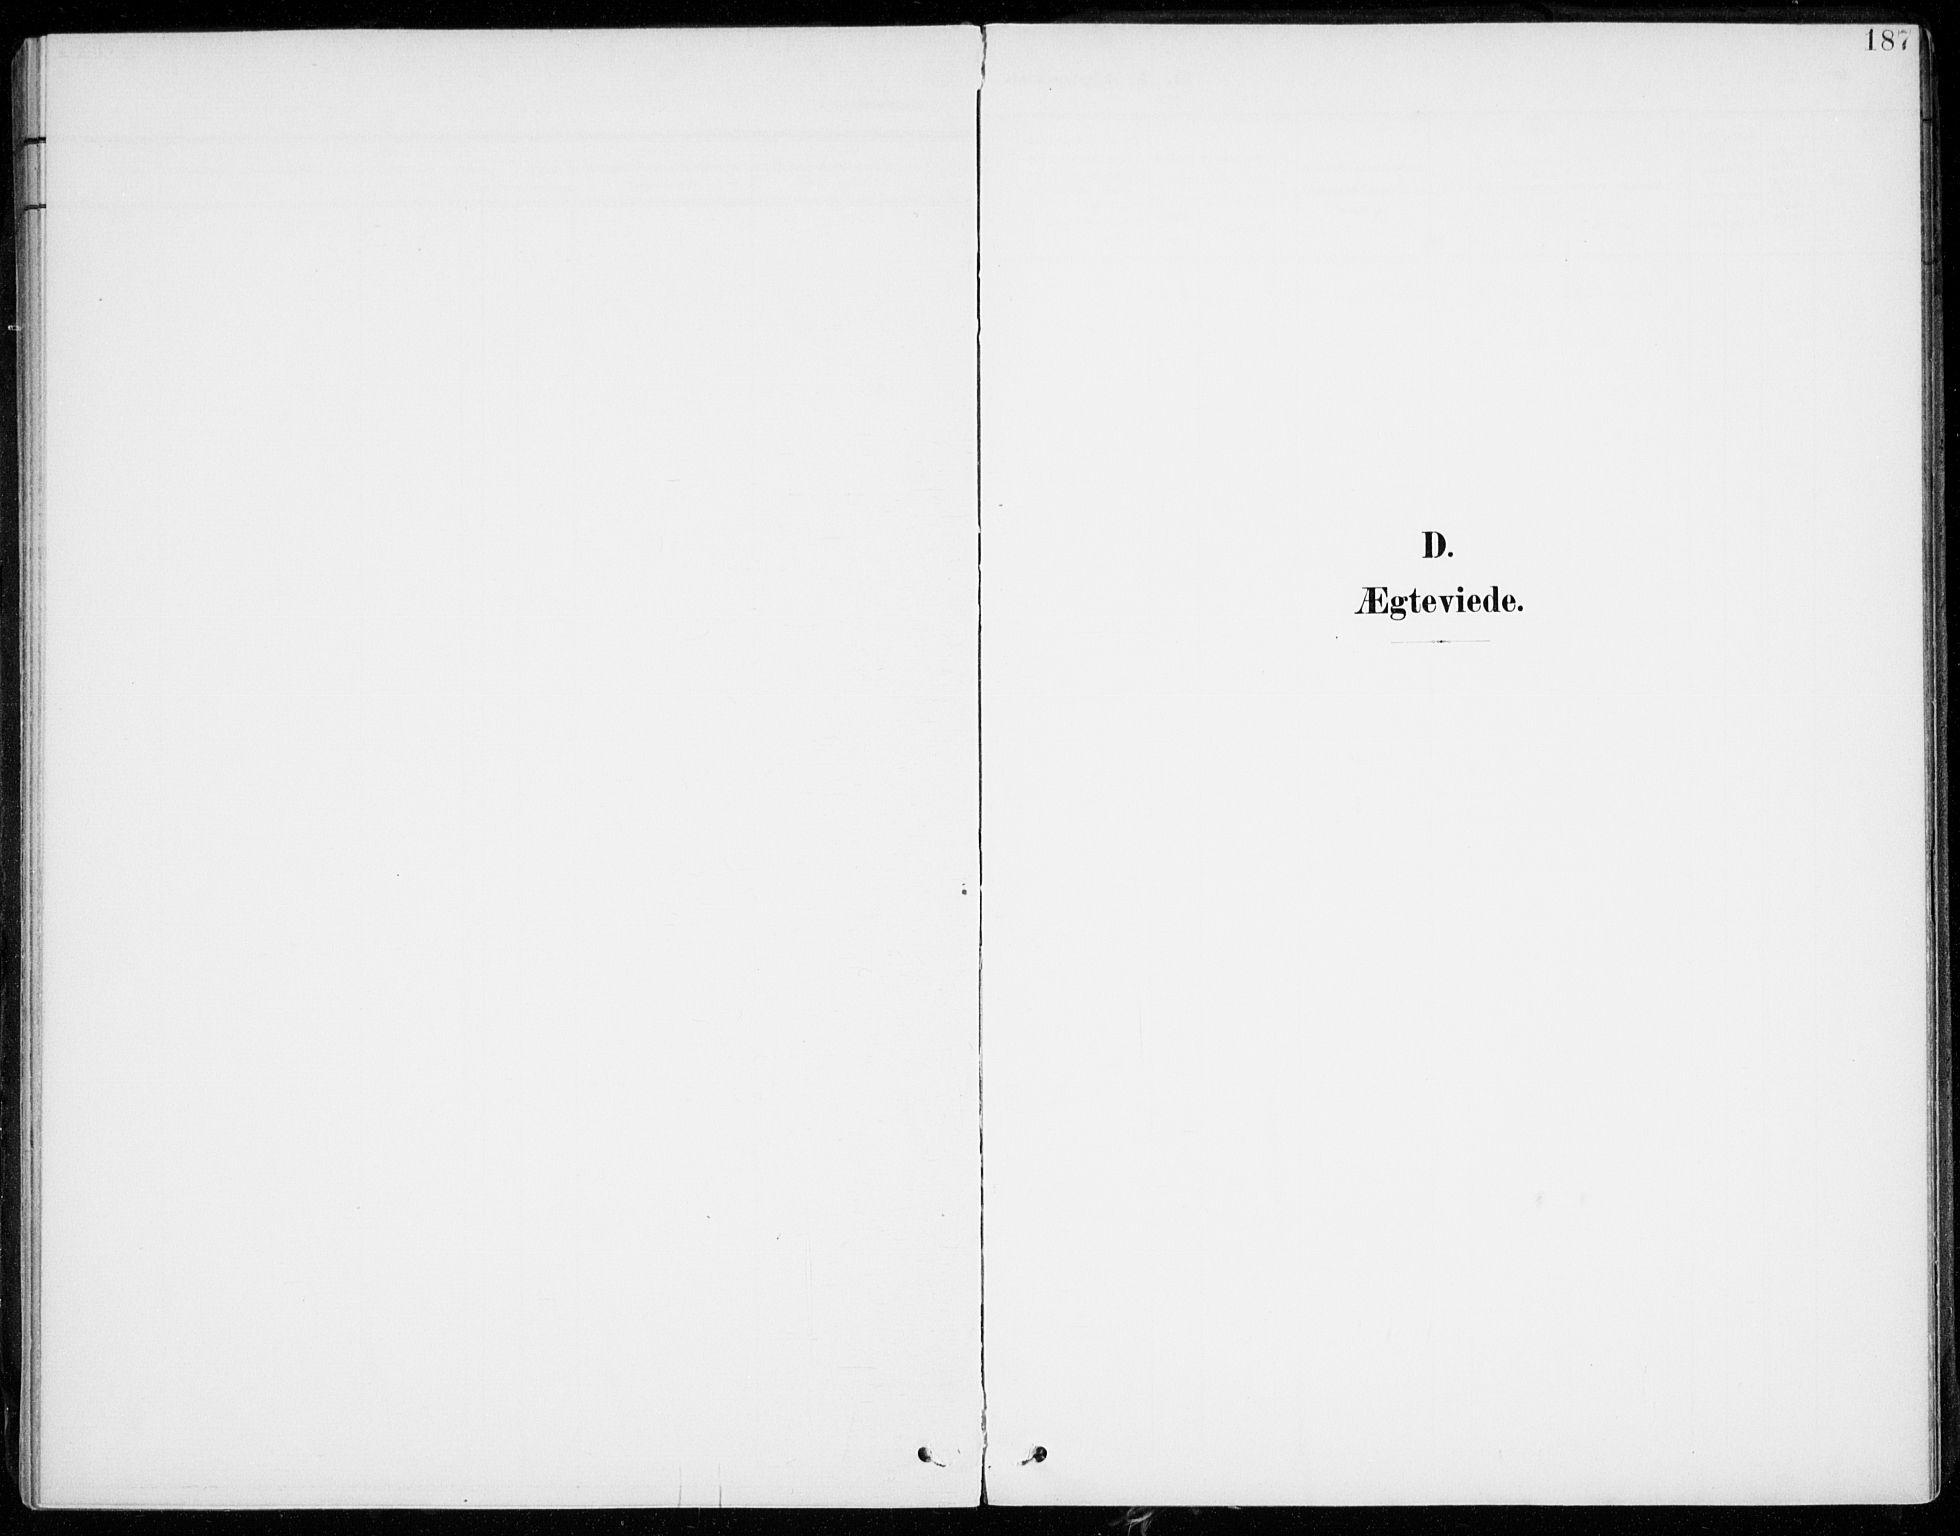 SATØ, Lenvik sokneprestembete, H/Ha: Ministerialbok nr. 14, 1899-1909, s. 187